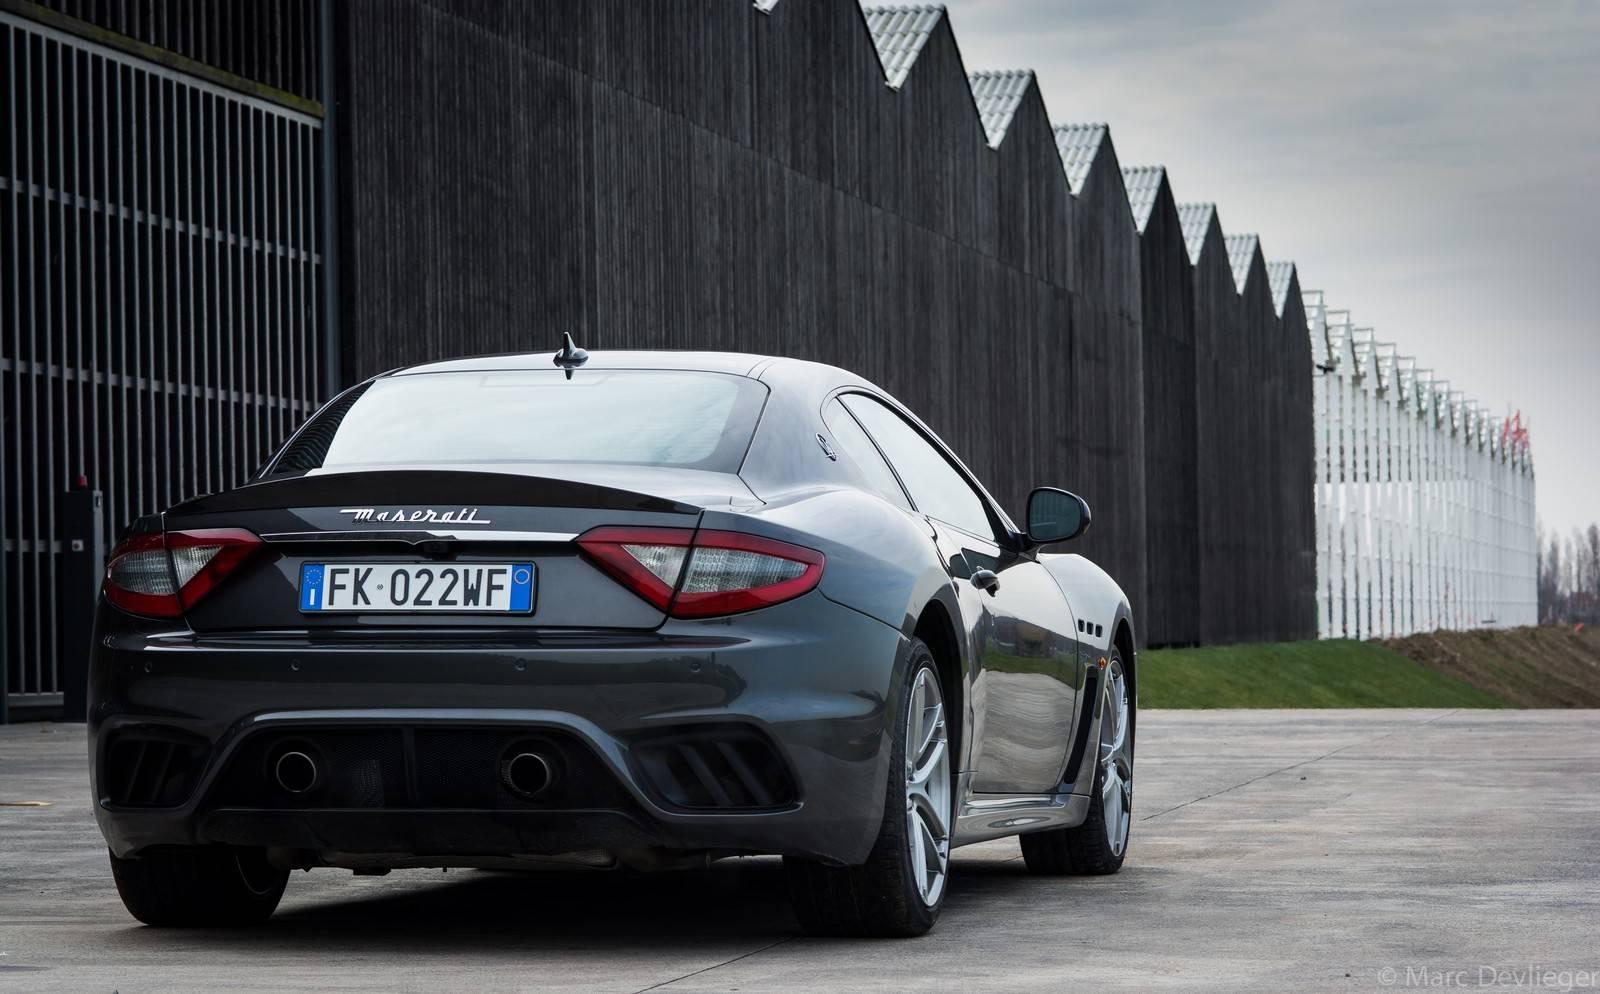 Used Maserati Granturismo >> 2018 Maserati GranTurismo MC Review - GTspirit